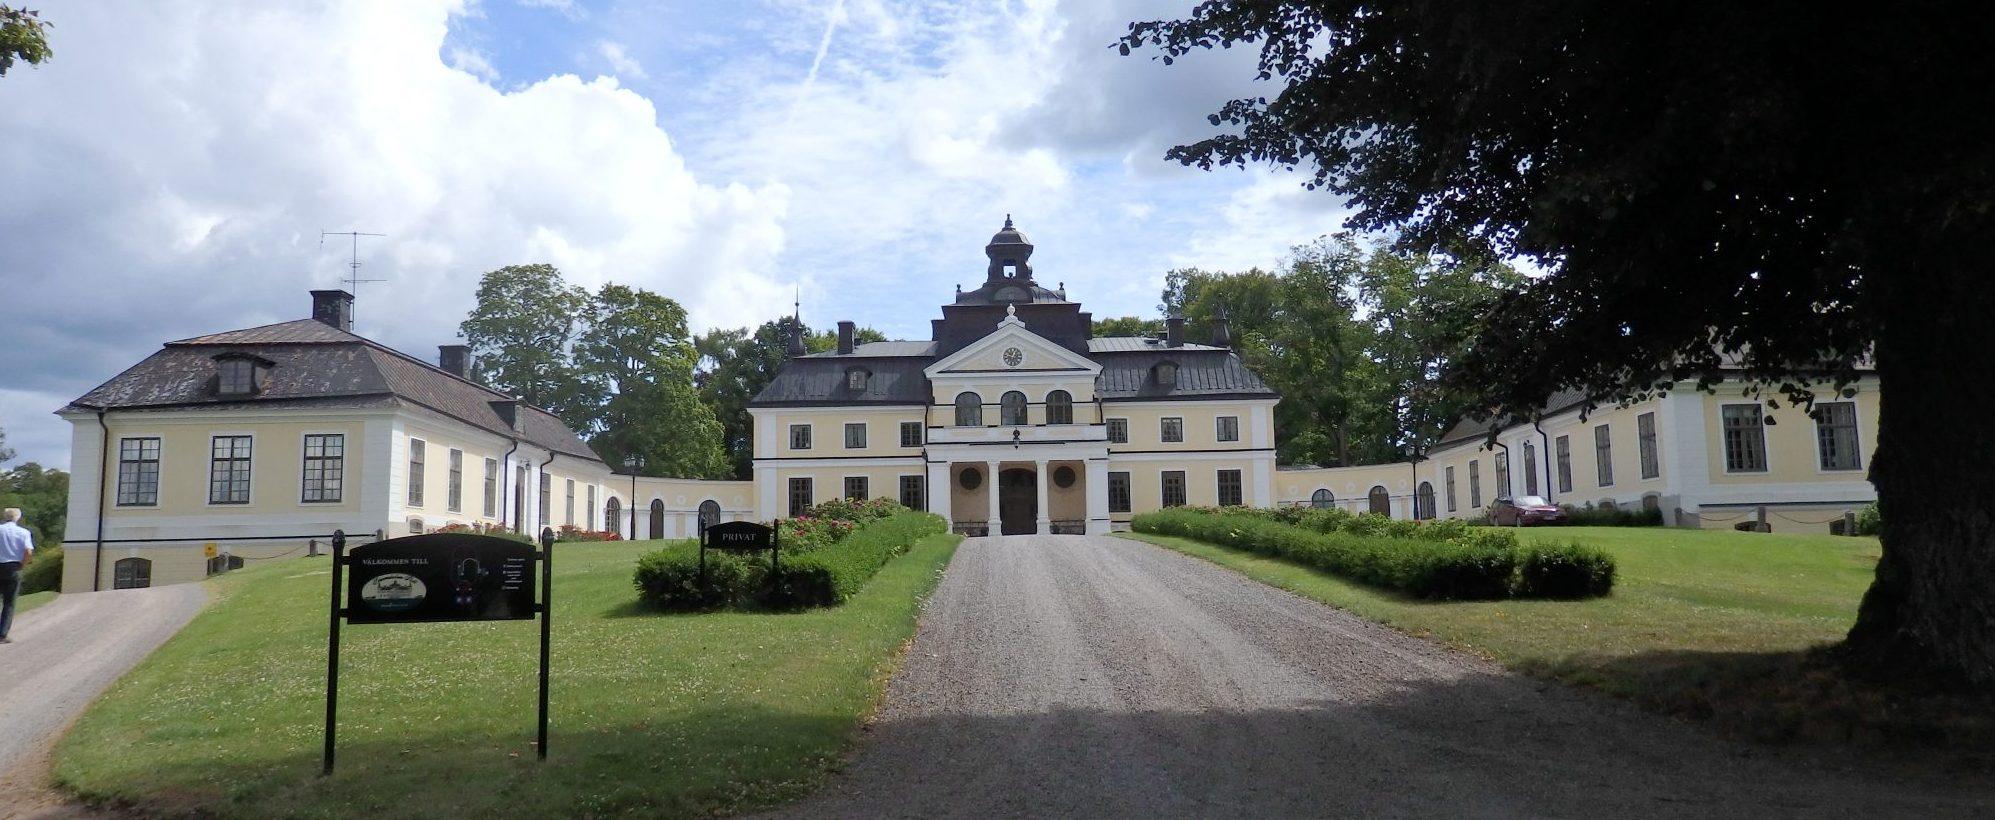 front view of Sparreholms manor, Sormland, Sweden